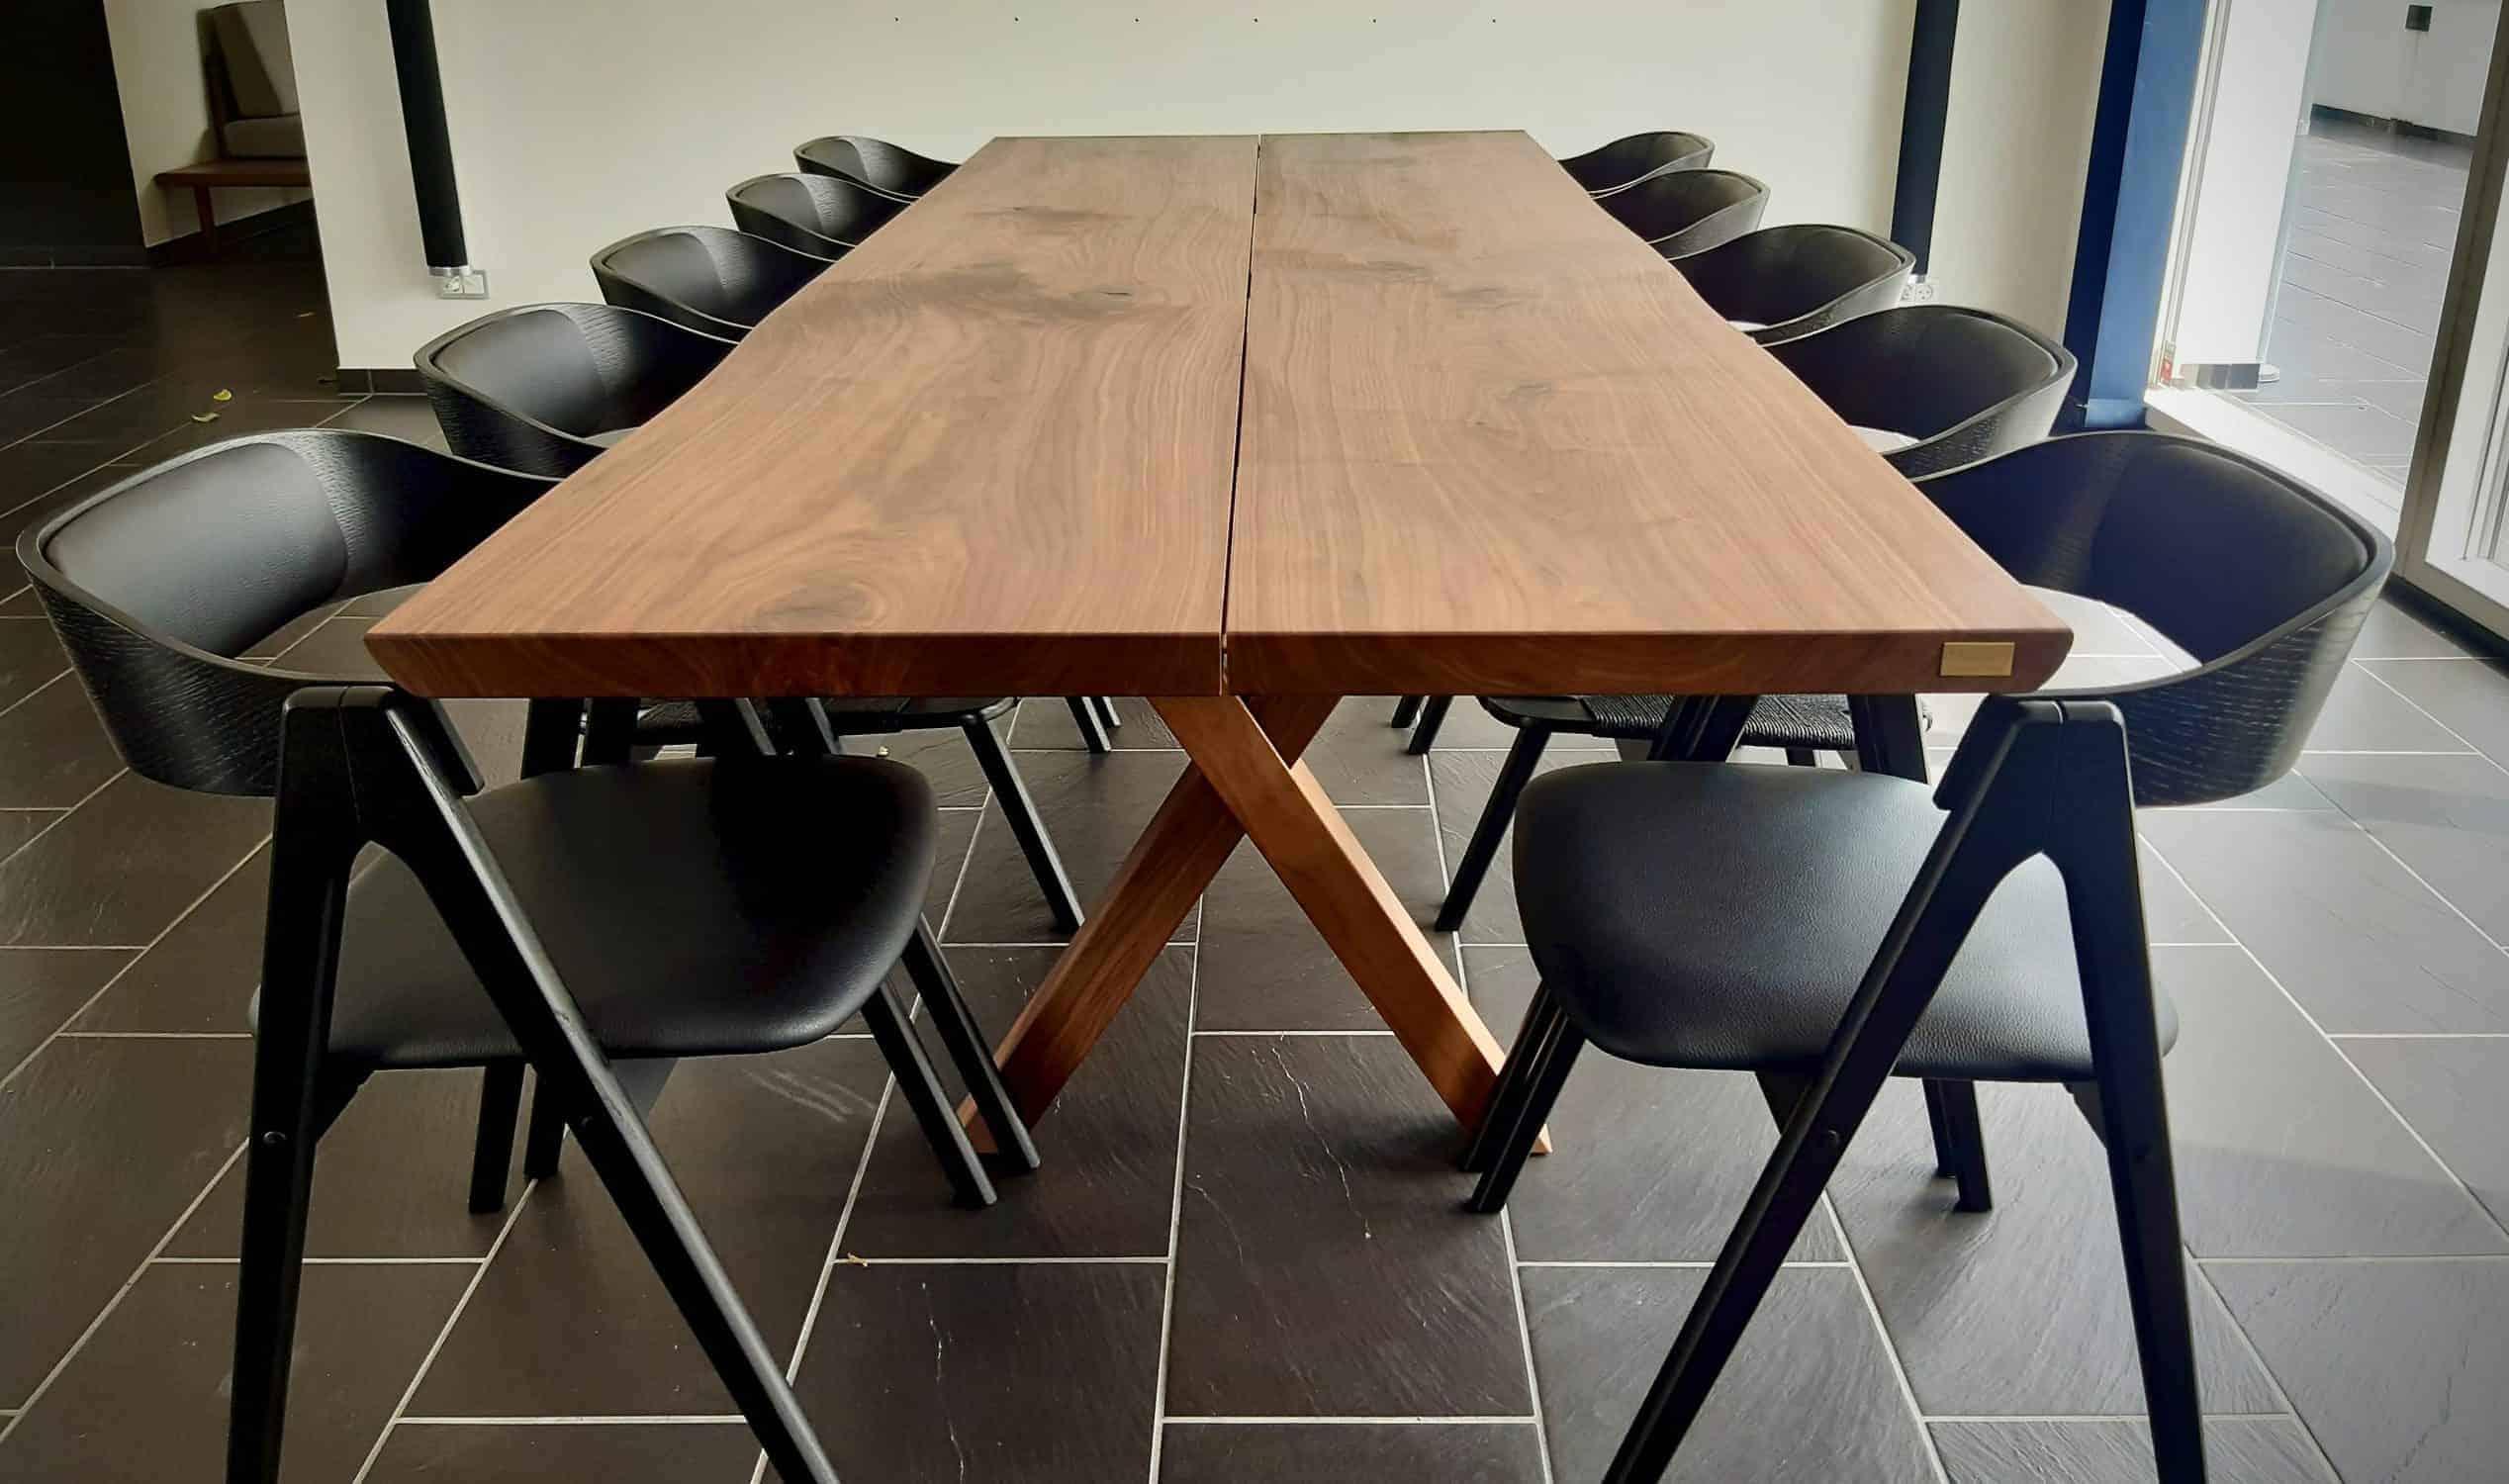 plankebord planke bord i trae Kaerbygård 10 scaled